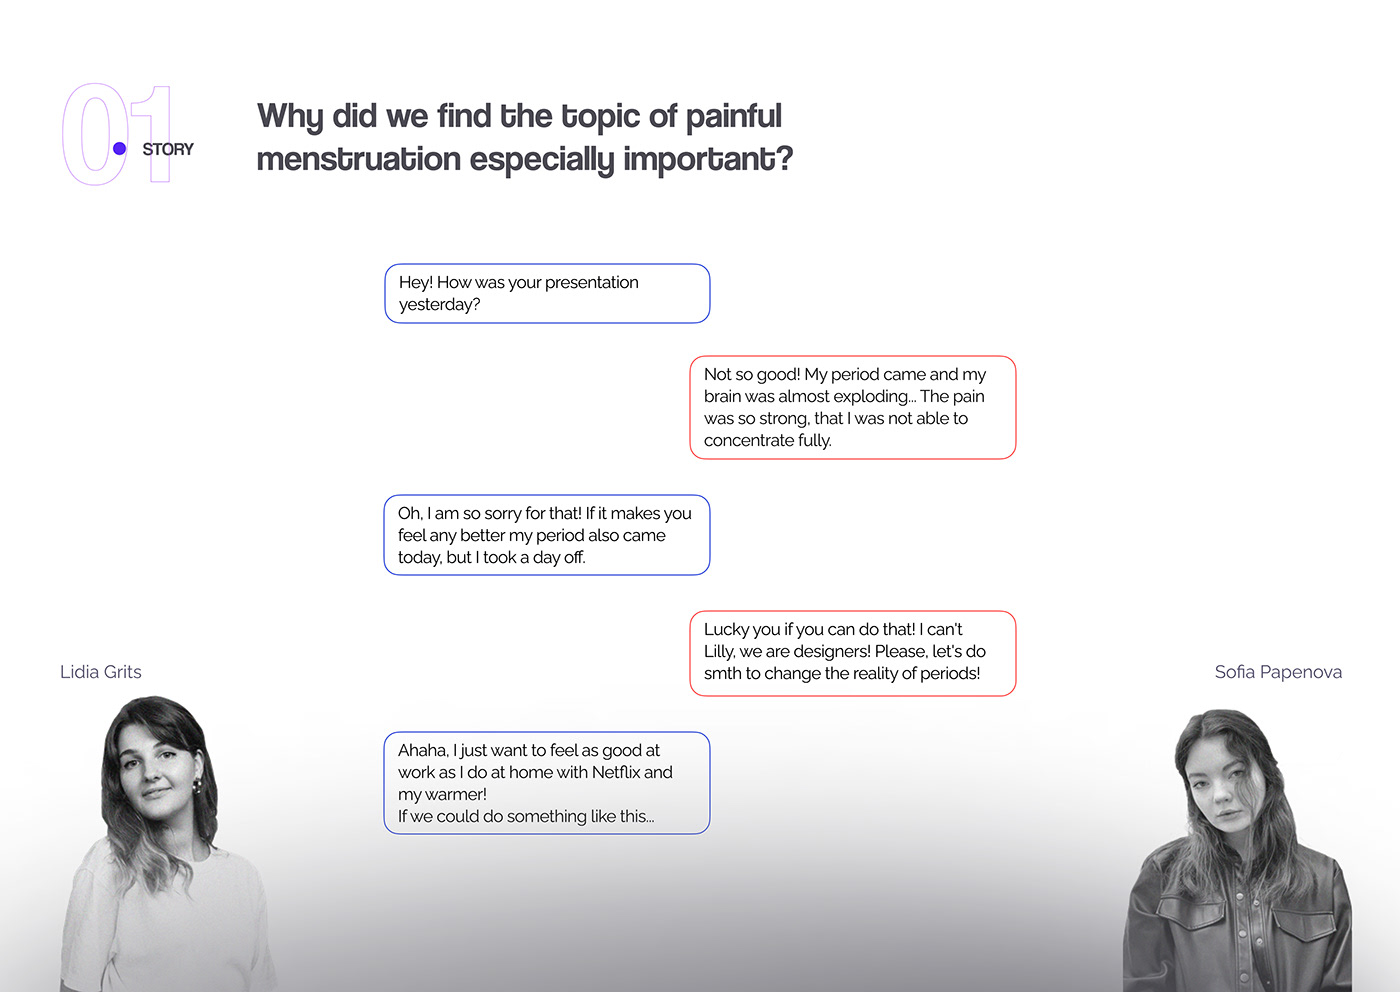 Accessory design designthinking industrialdesign menstruation period product productdesign women womendesign